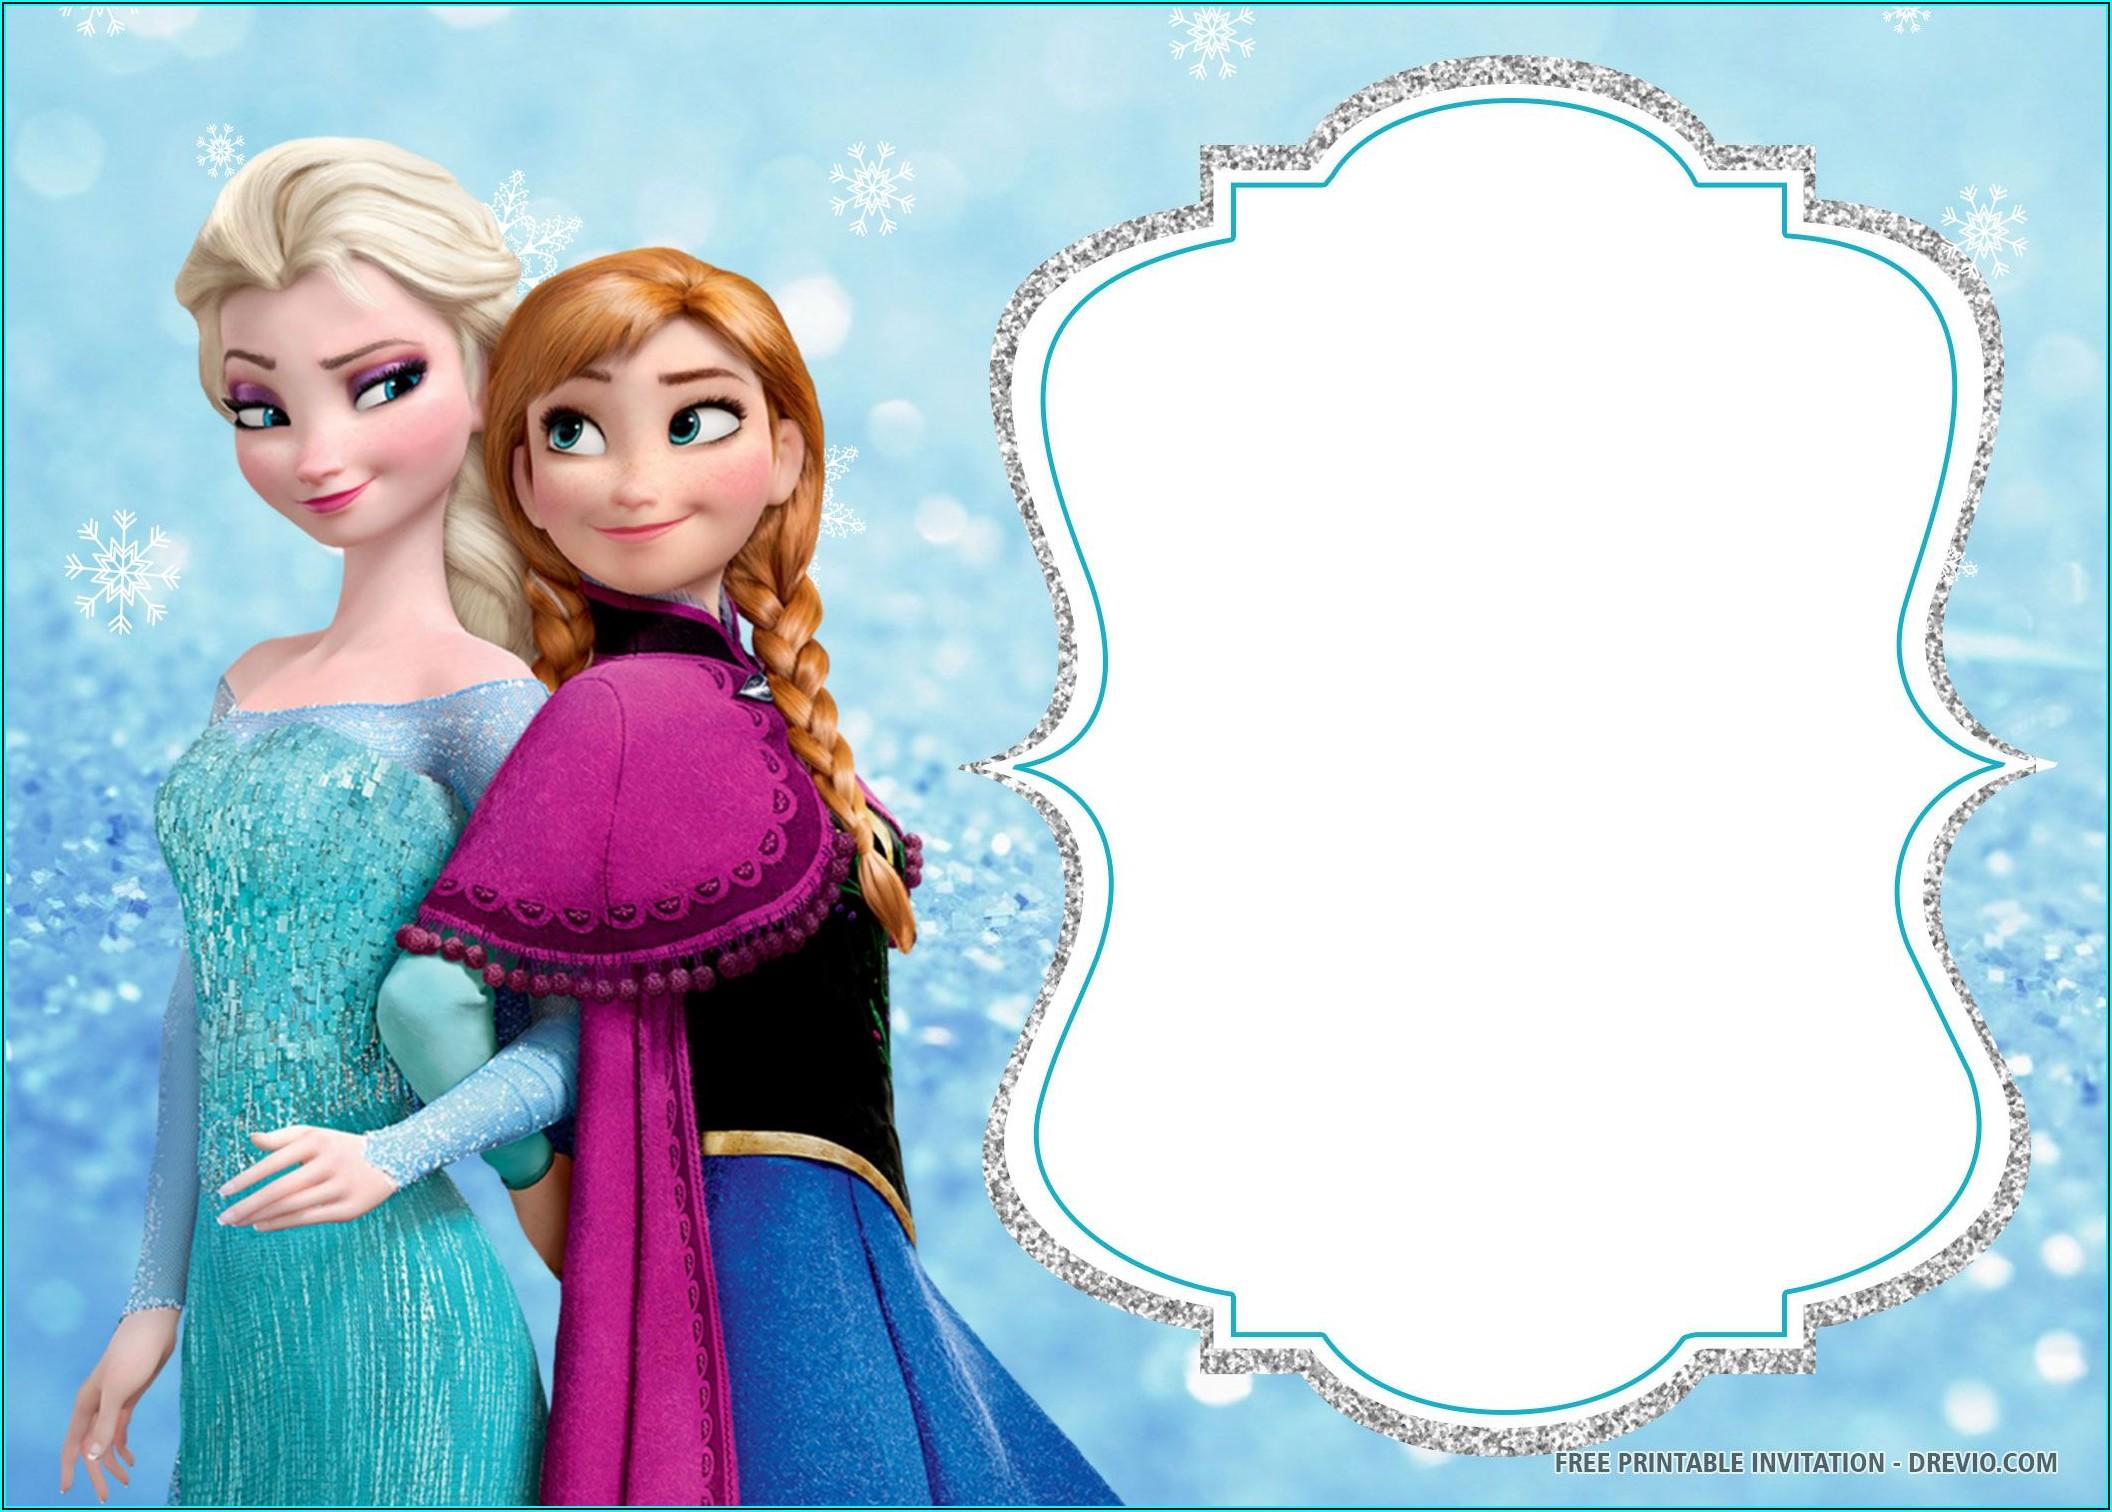 Free Downloadable Frozen Birthday Invitations